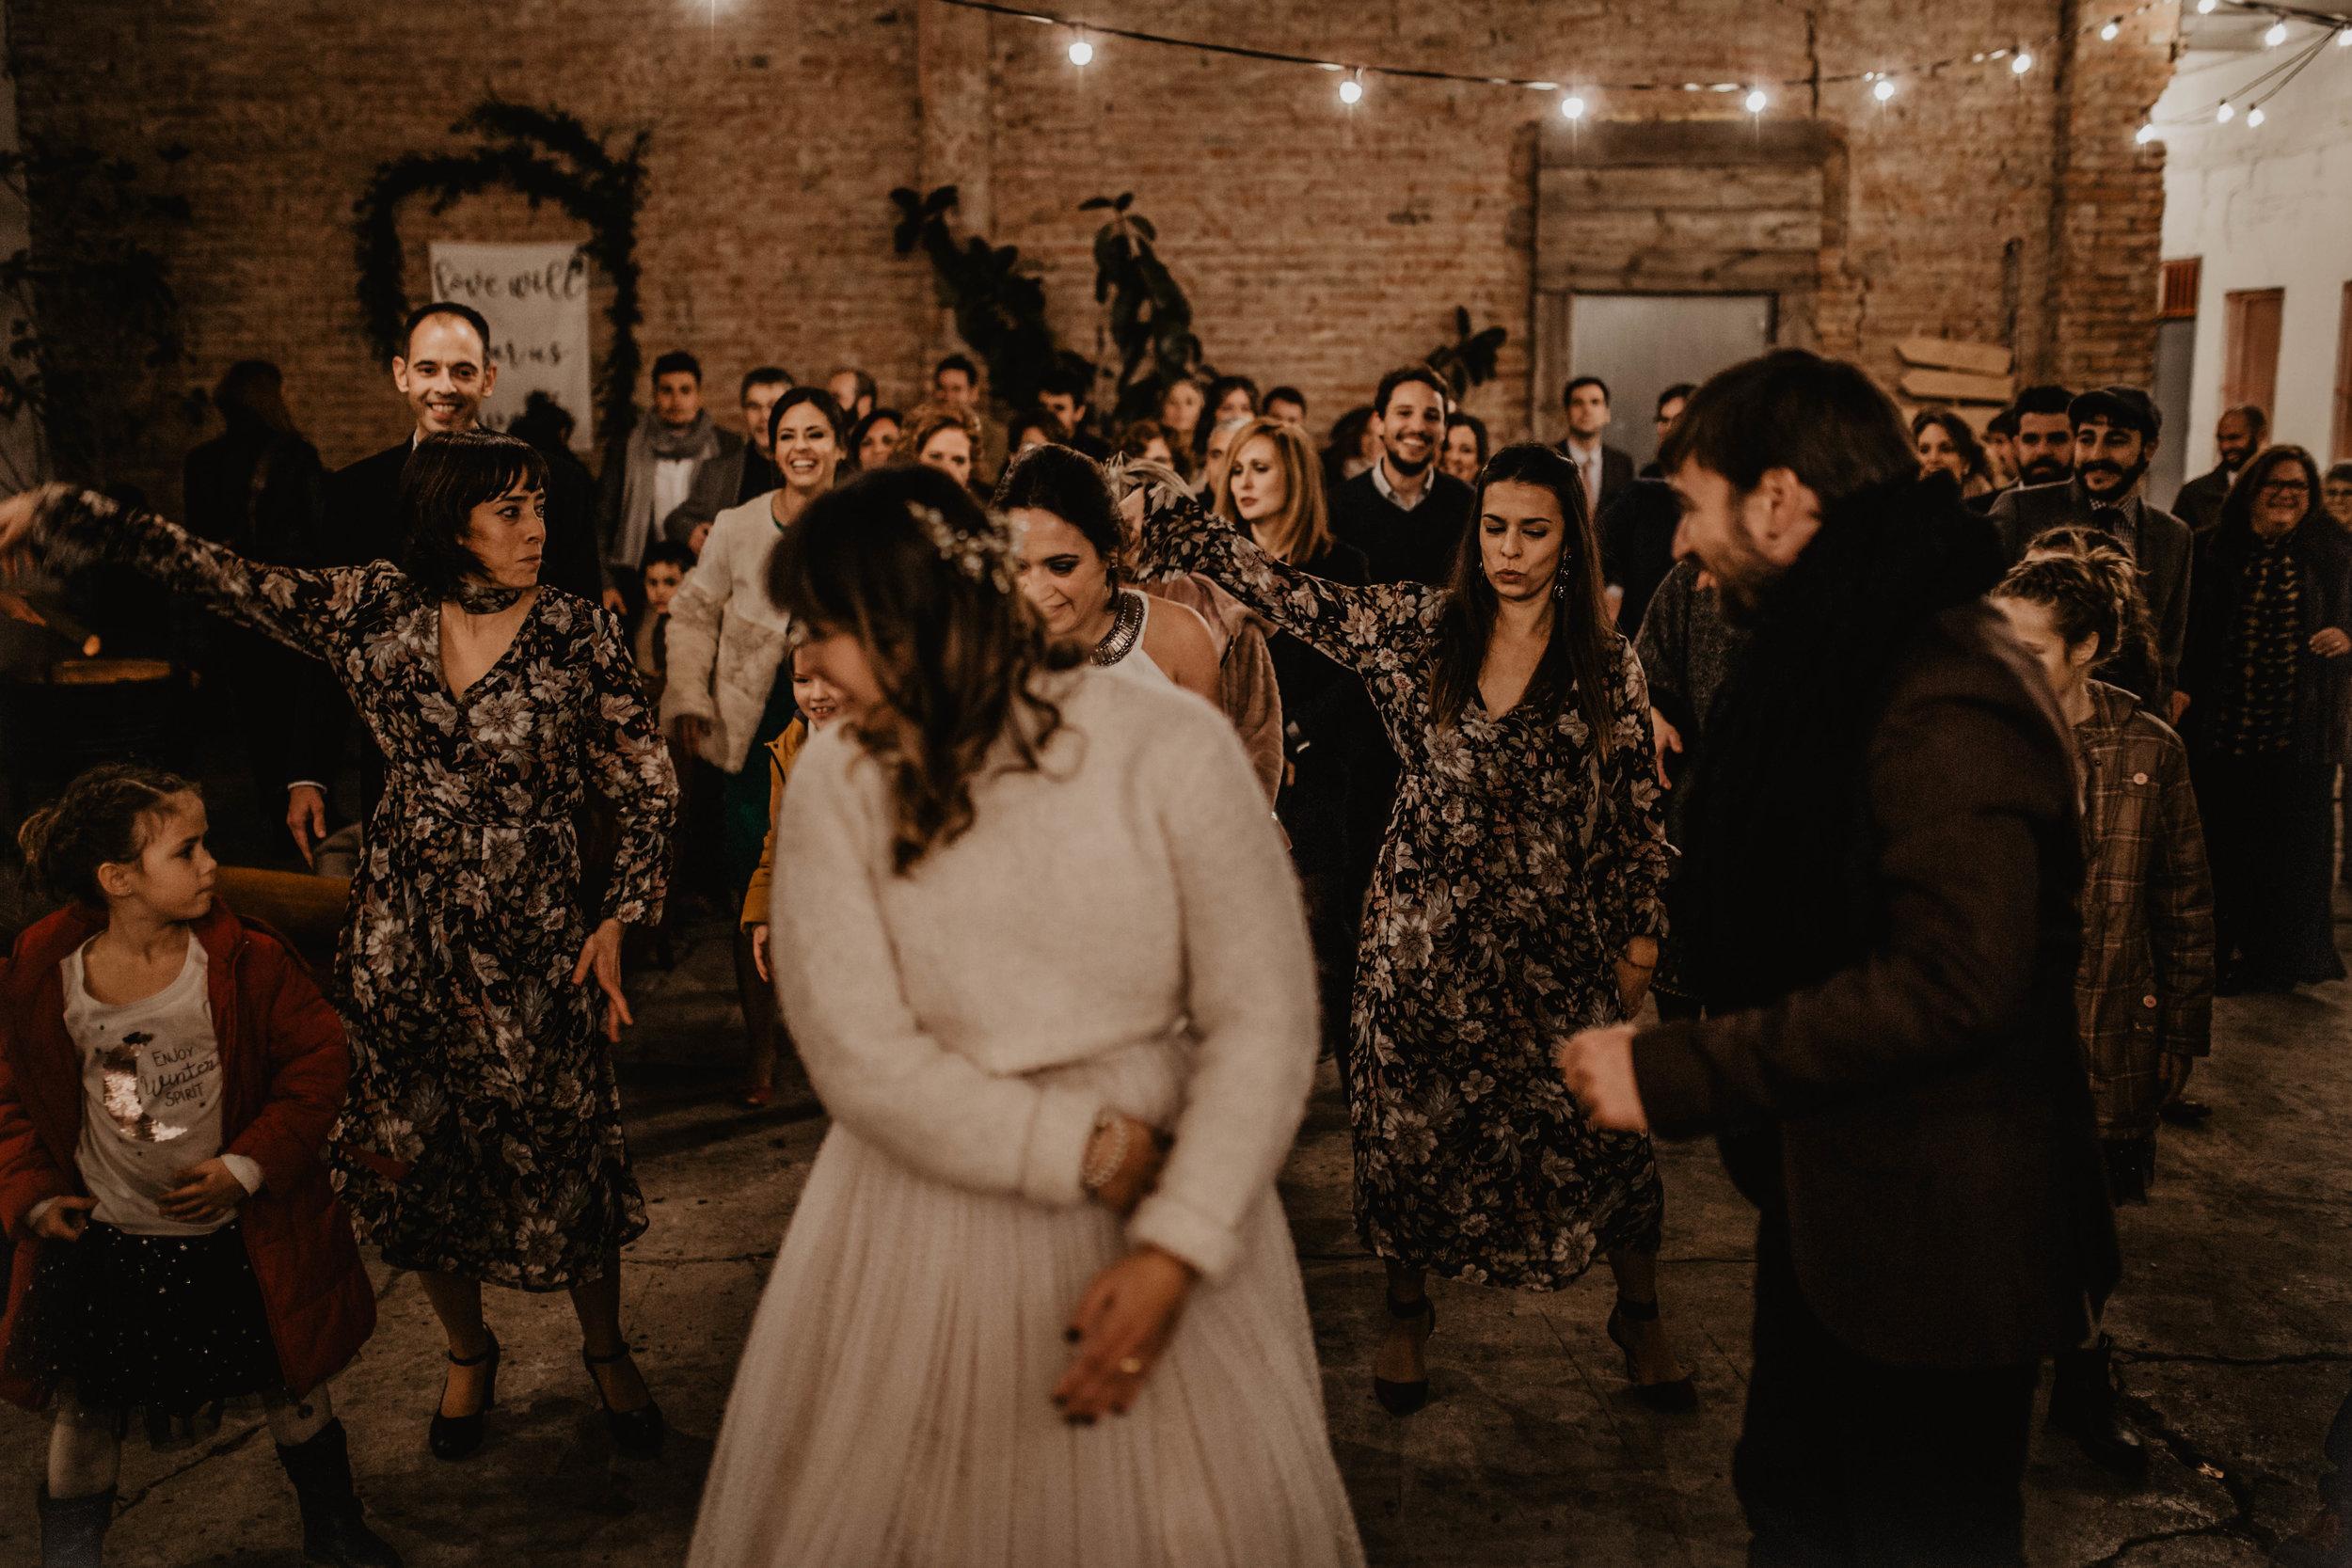 thenortherngirlphotography-photography-weddingphotography-couple-bodasconestilo-bodasenbarcelona-martadavid-1140.jpg